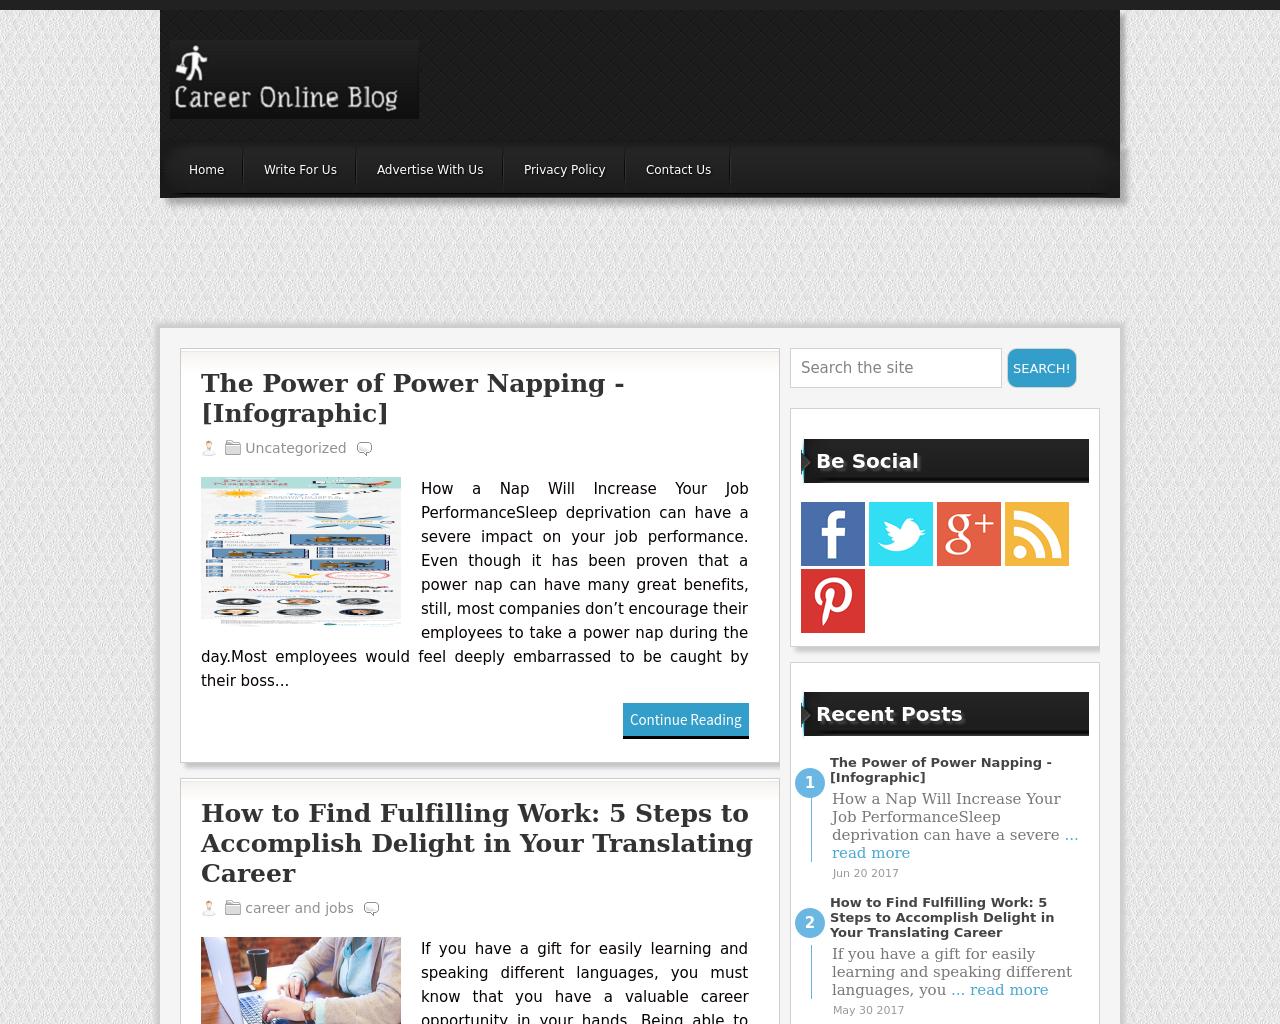 Career-Online-Blog-Advertising-Reviews-Pricing